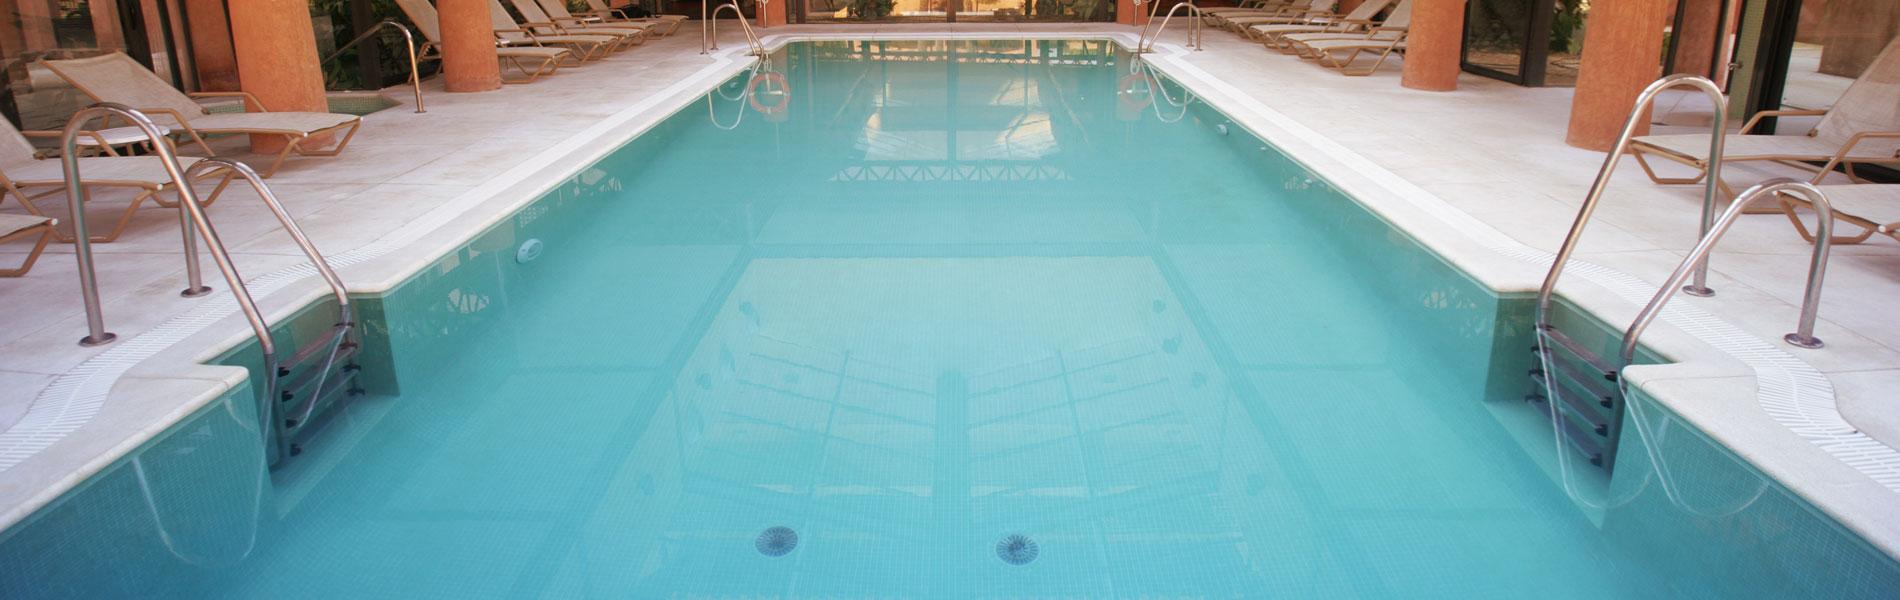 C mo se hacen piscinas de arena premix marbletite for Se hacen piscinas